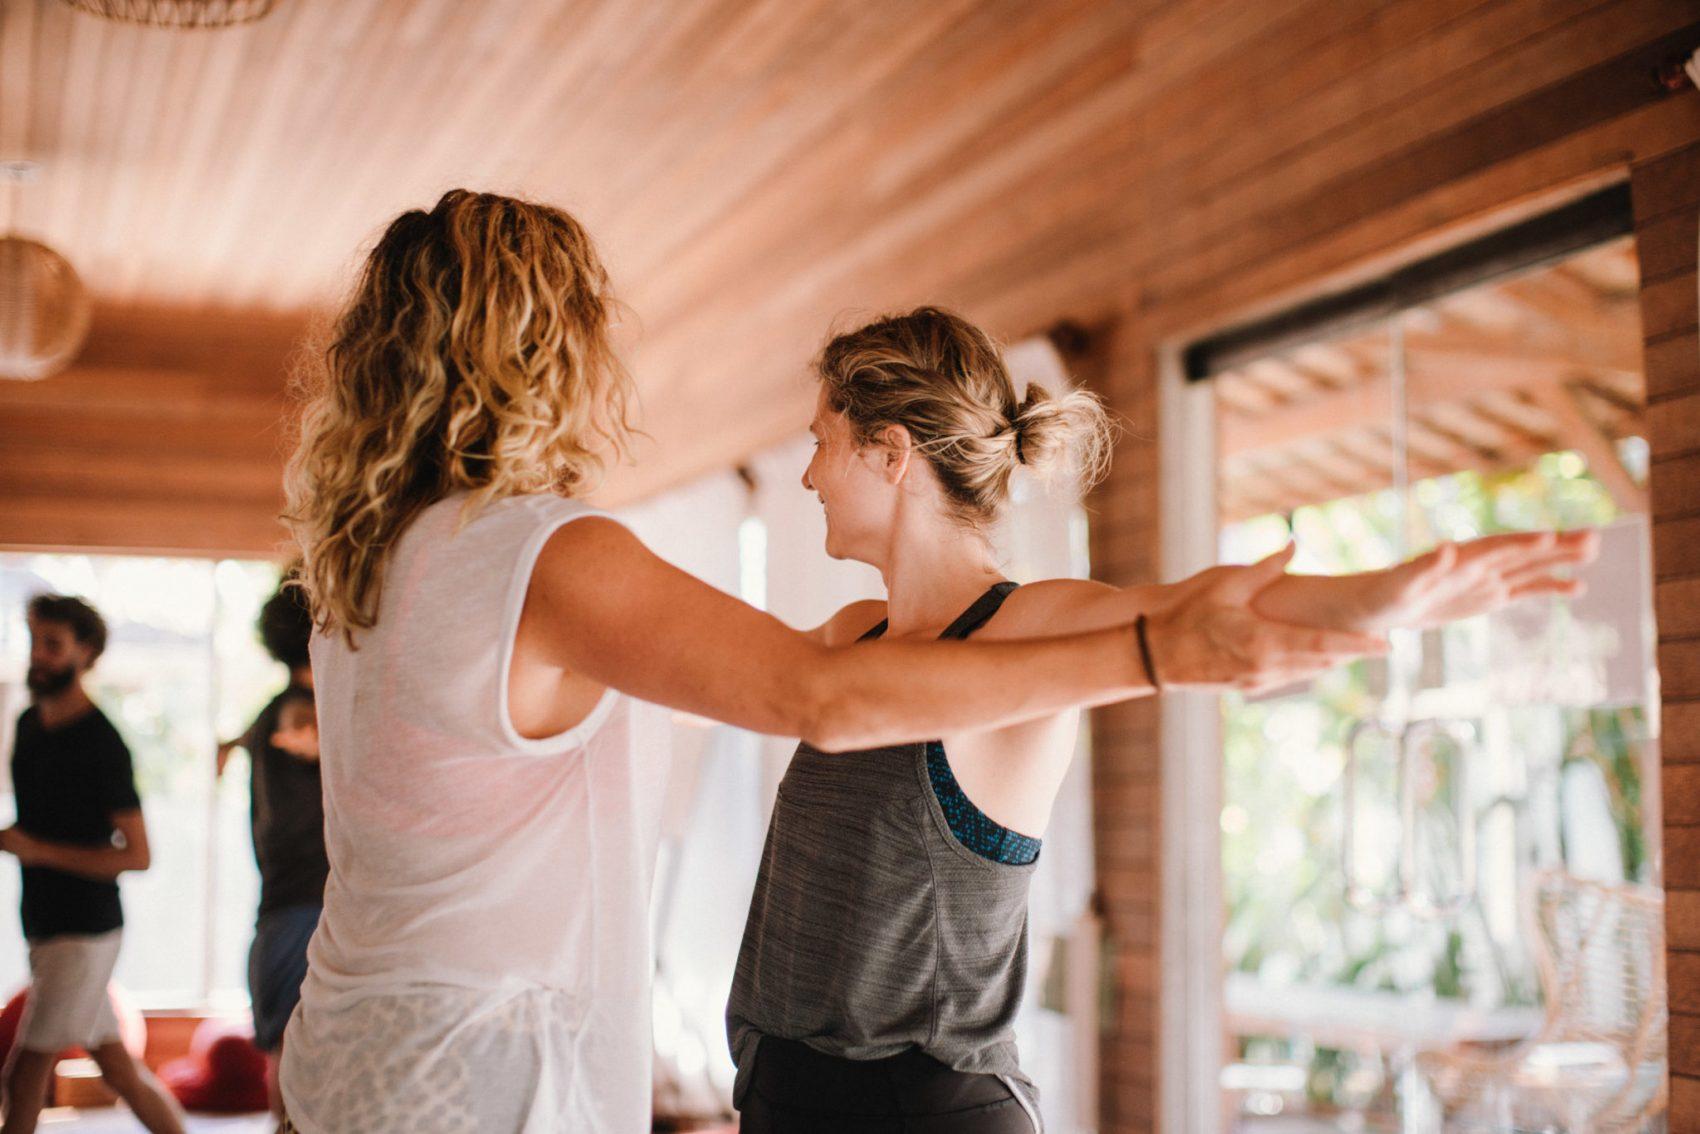 Stefan-Camilleri-Yoga-200hr-Teacher-Training-Bali-201910